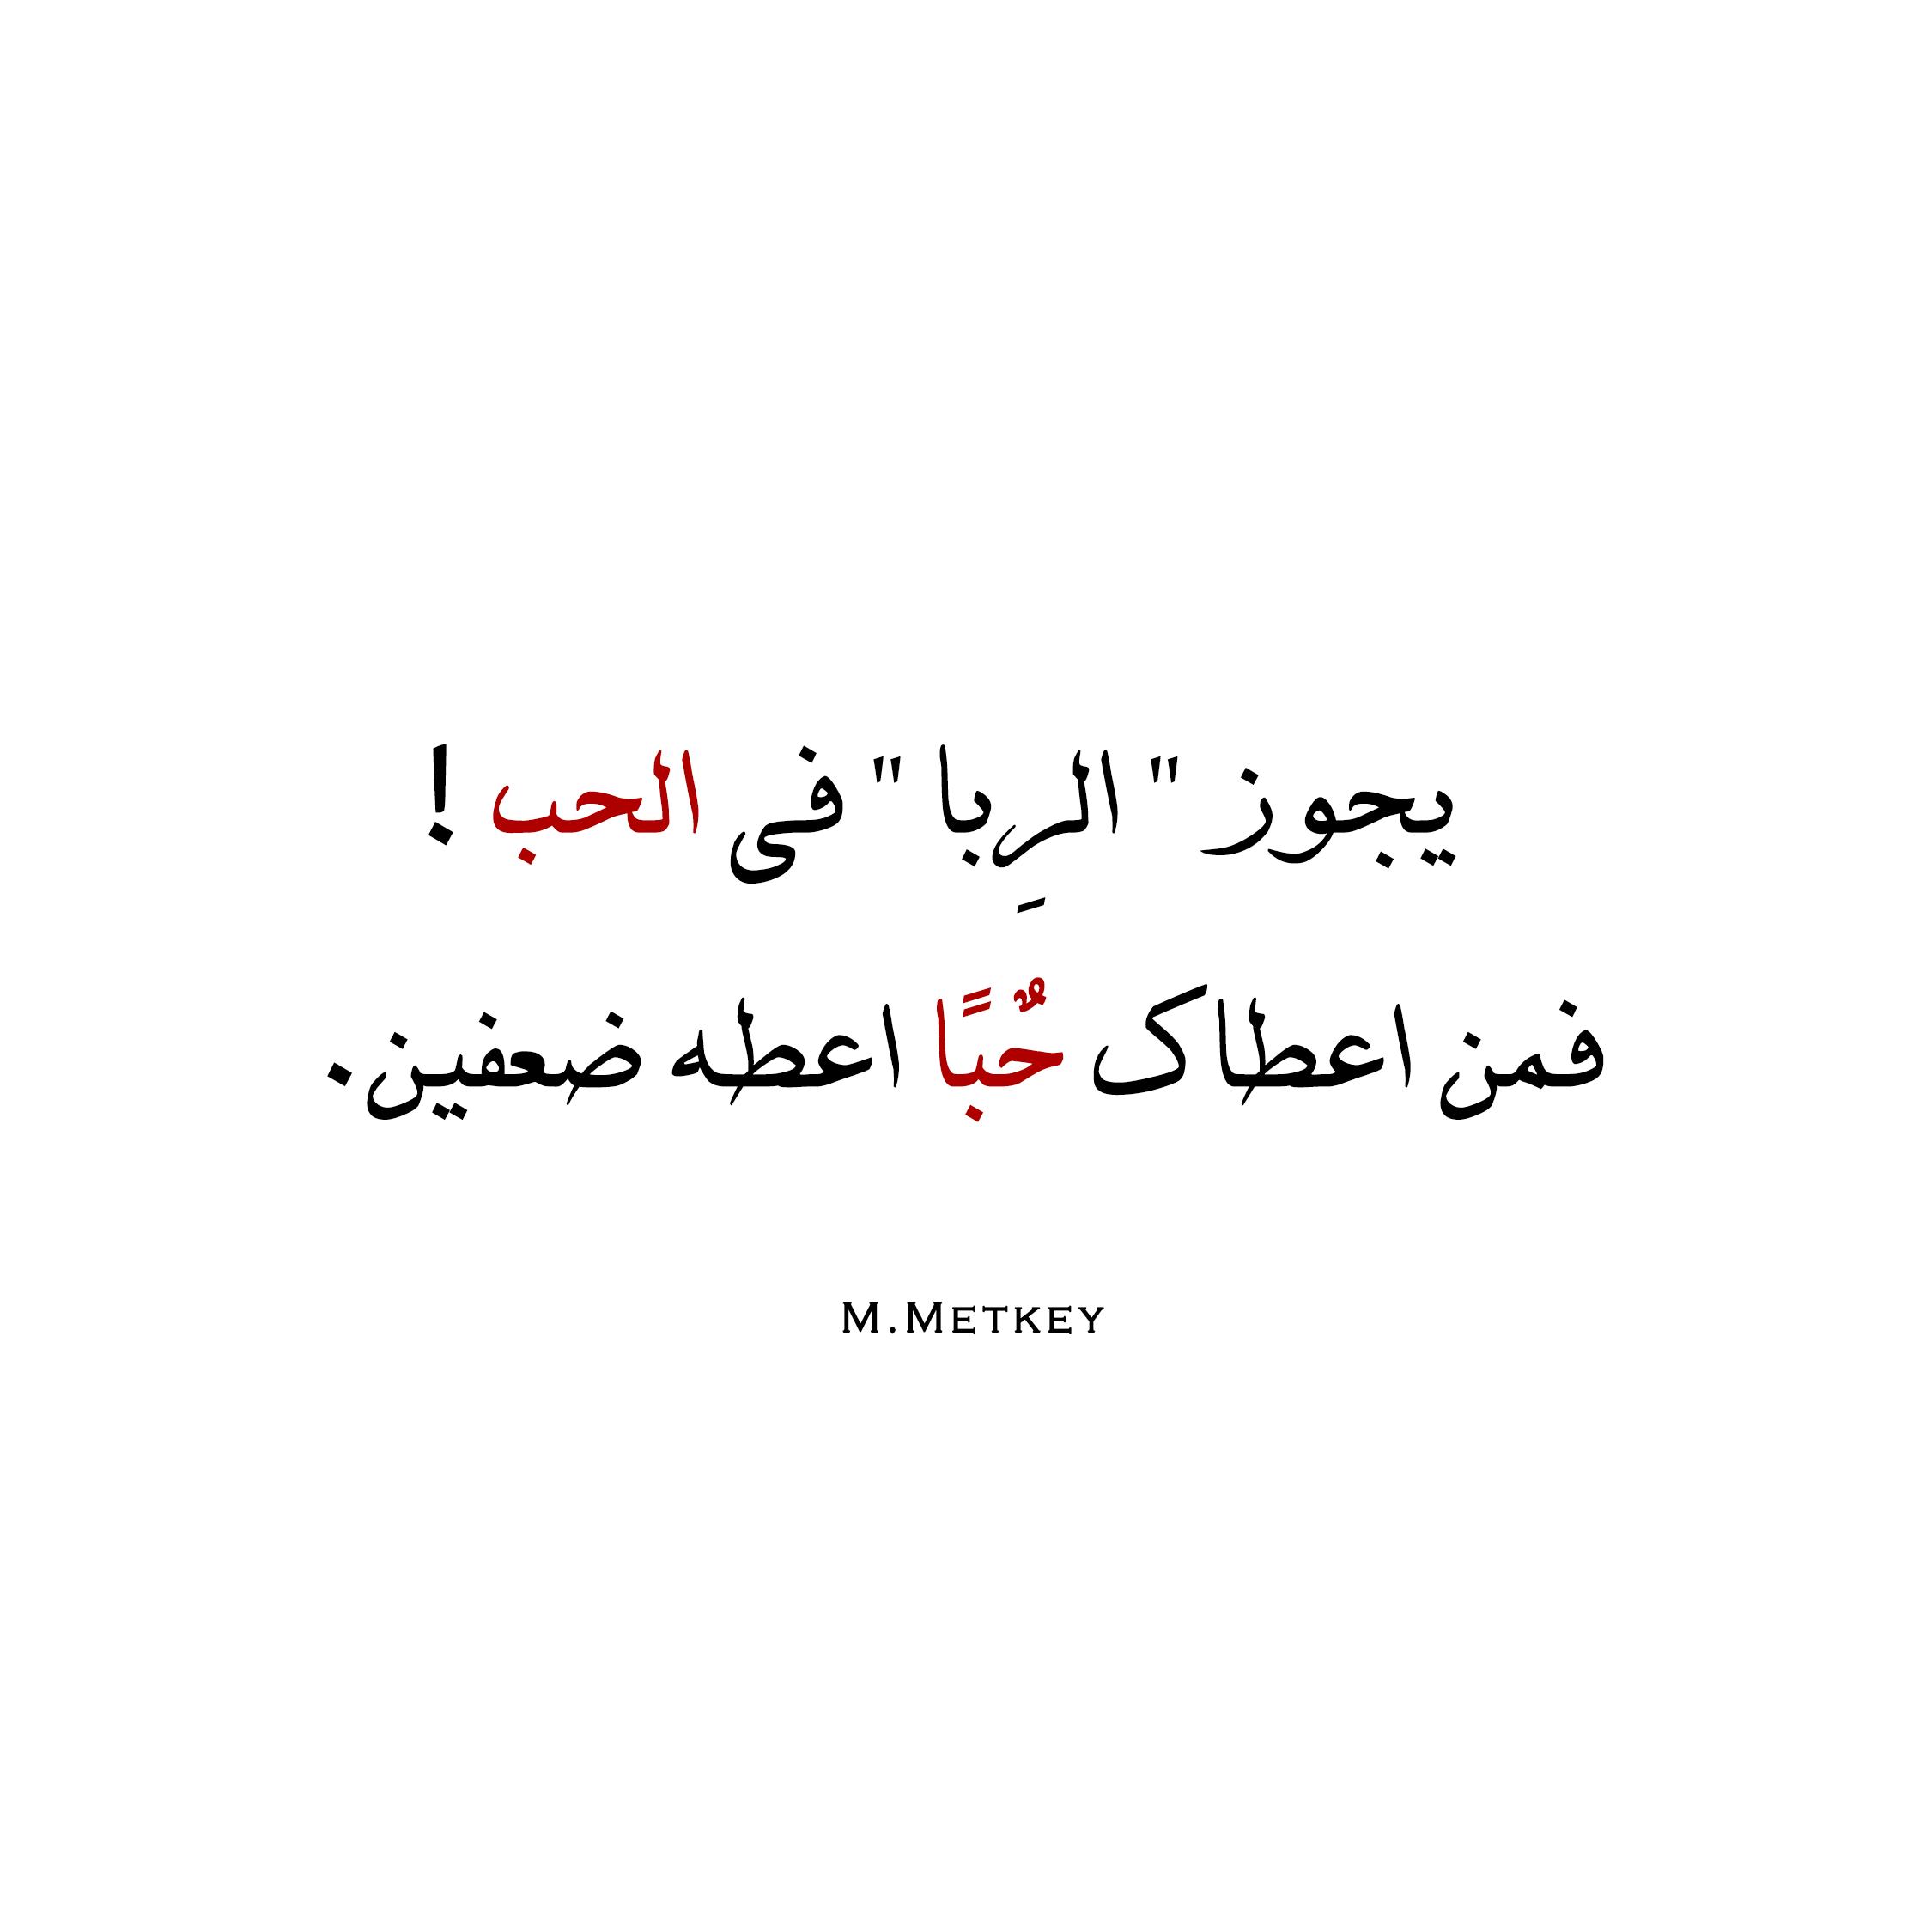 M Metkey اقتباسات Crush Quotes Quotations Arabic Love Quotes